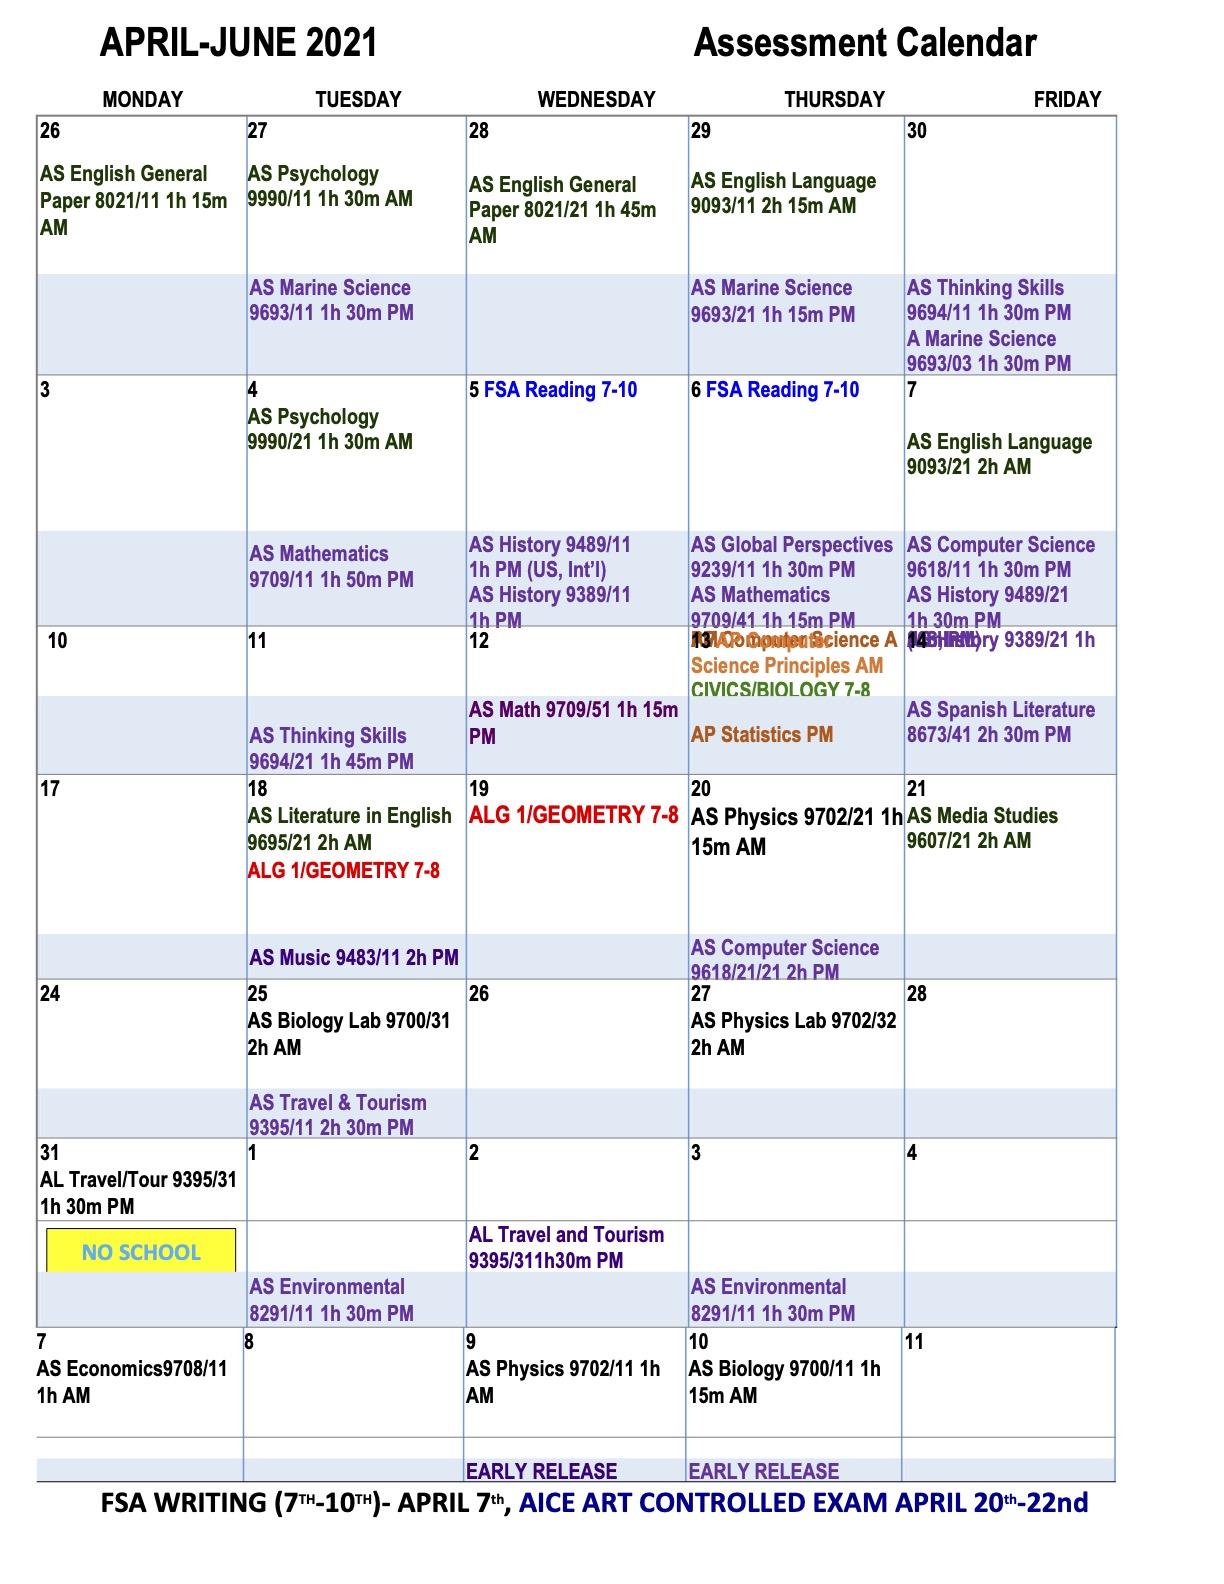 Spring 2021 Testing calendar